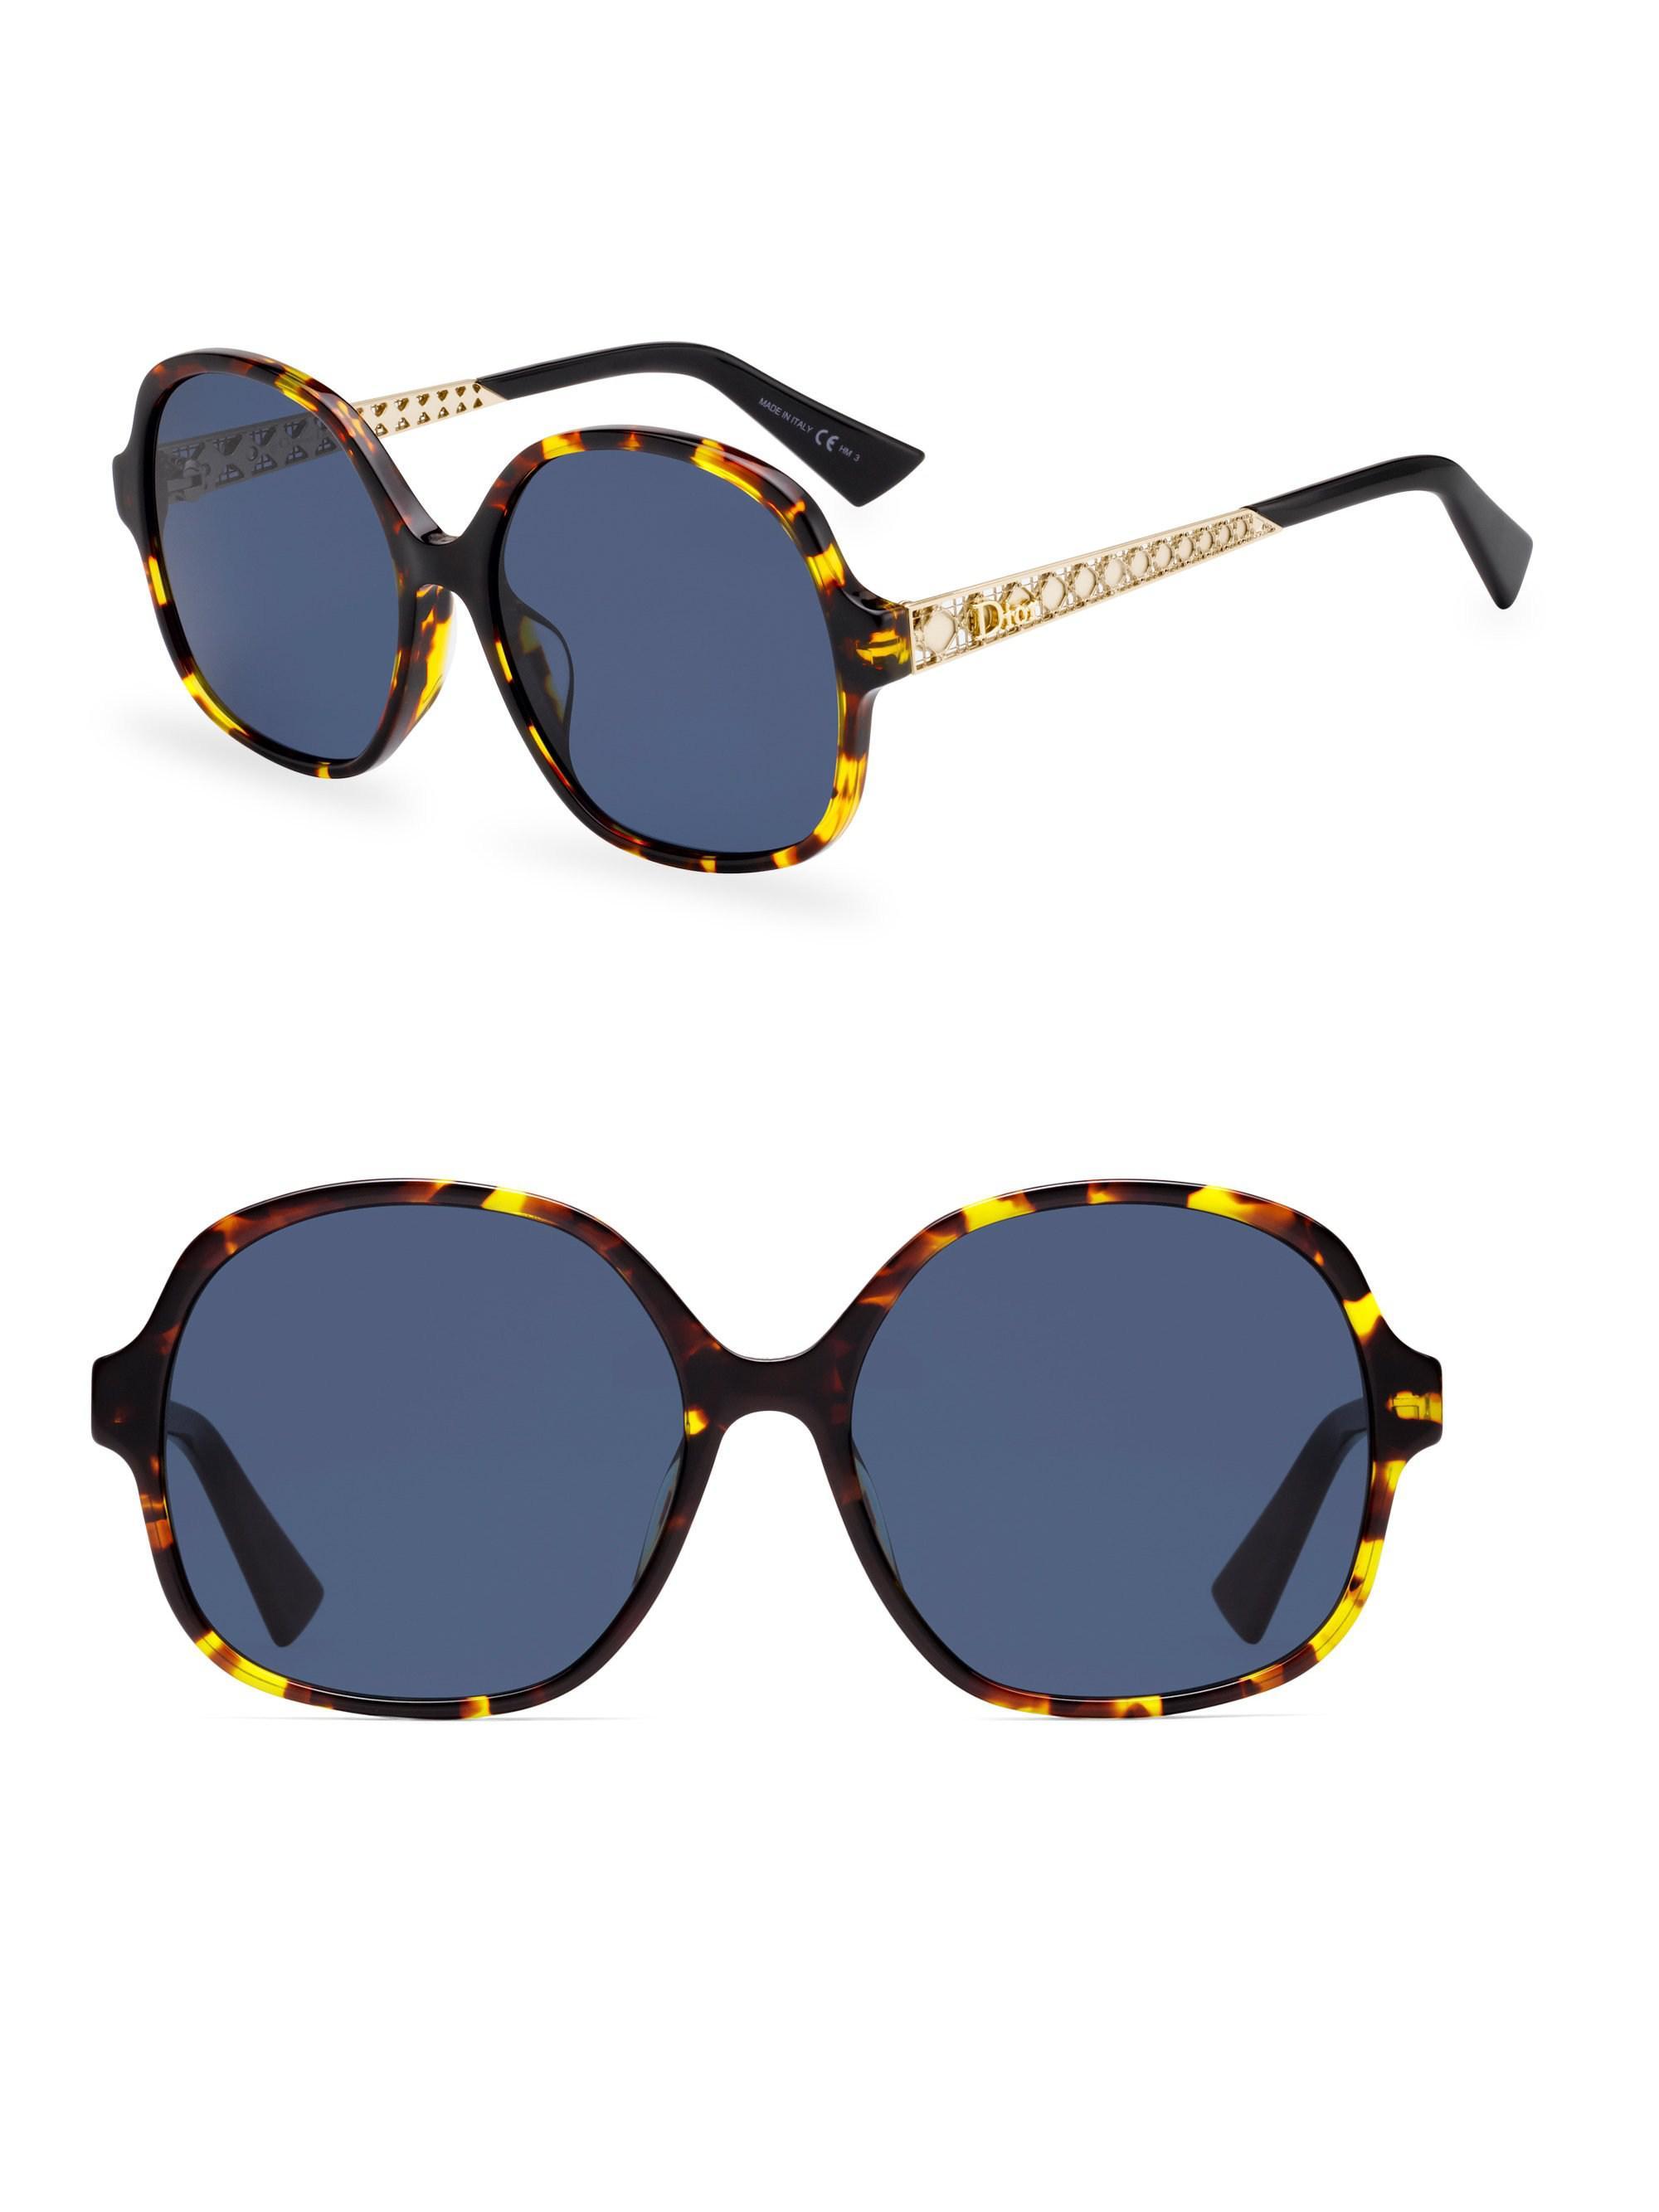 c3e433d1d83 Lyst - Dior Ama 58mm Oversized Round Sunglasses in Blue